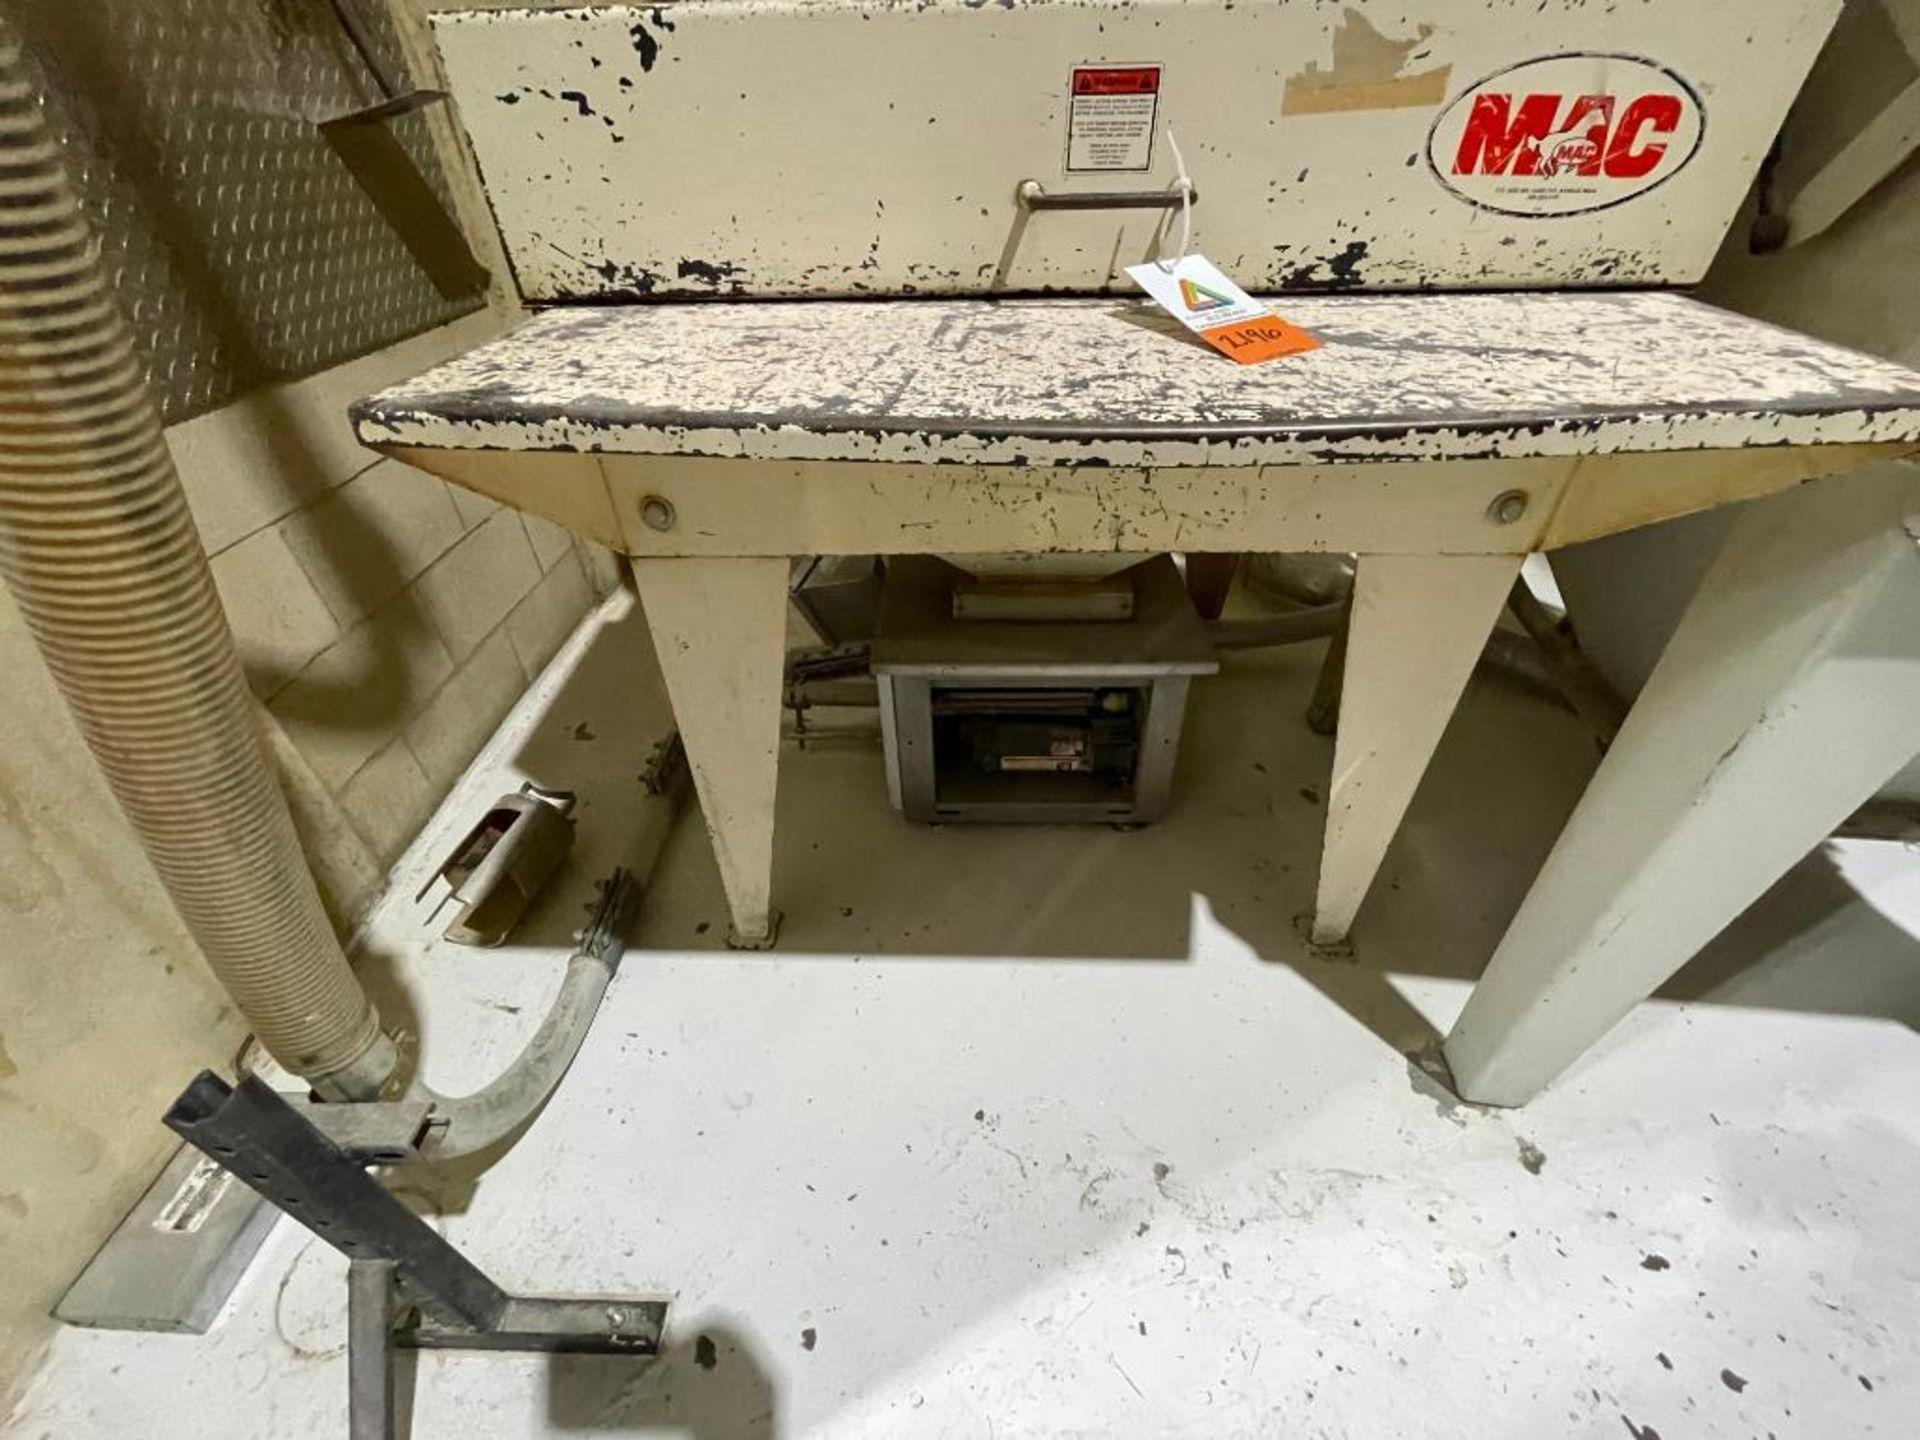 MAC dry ingredients dump station - Image 4 of 24